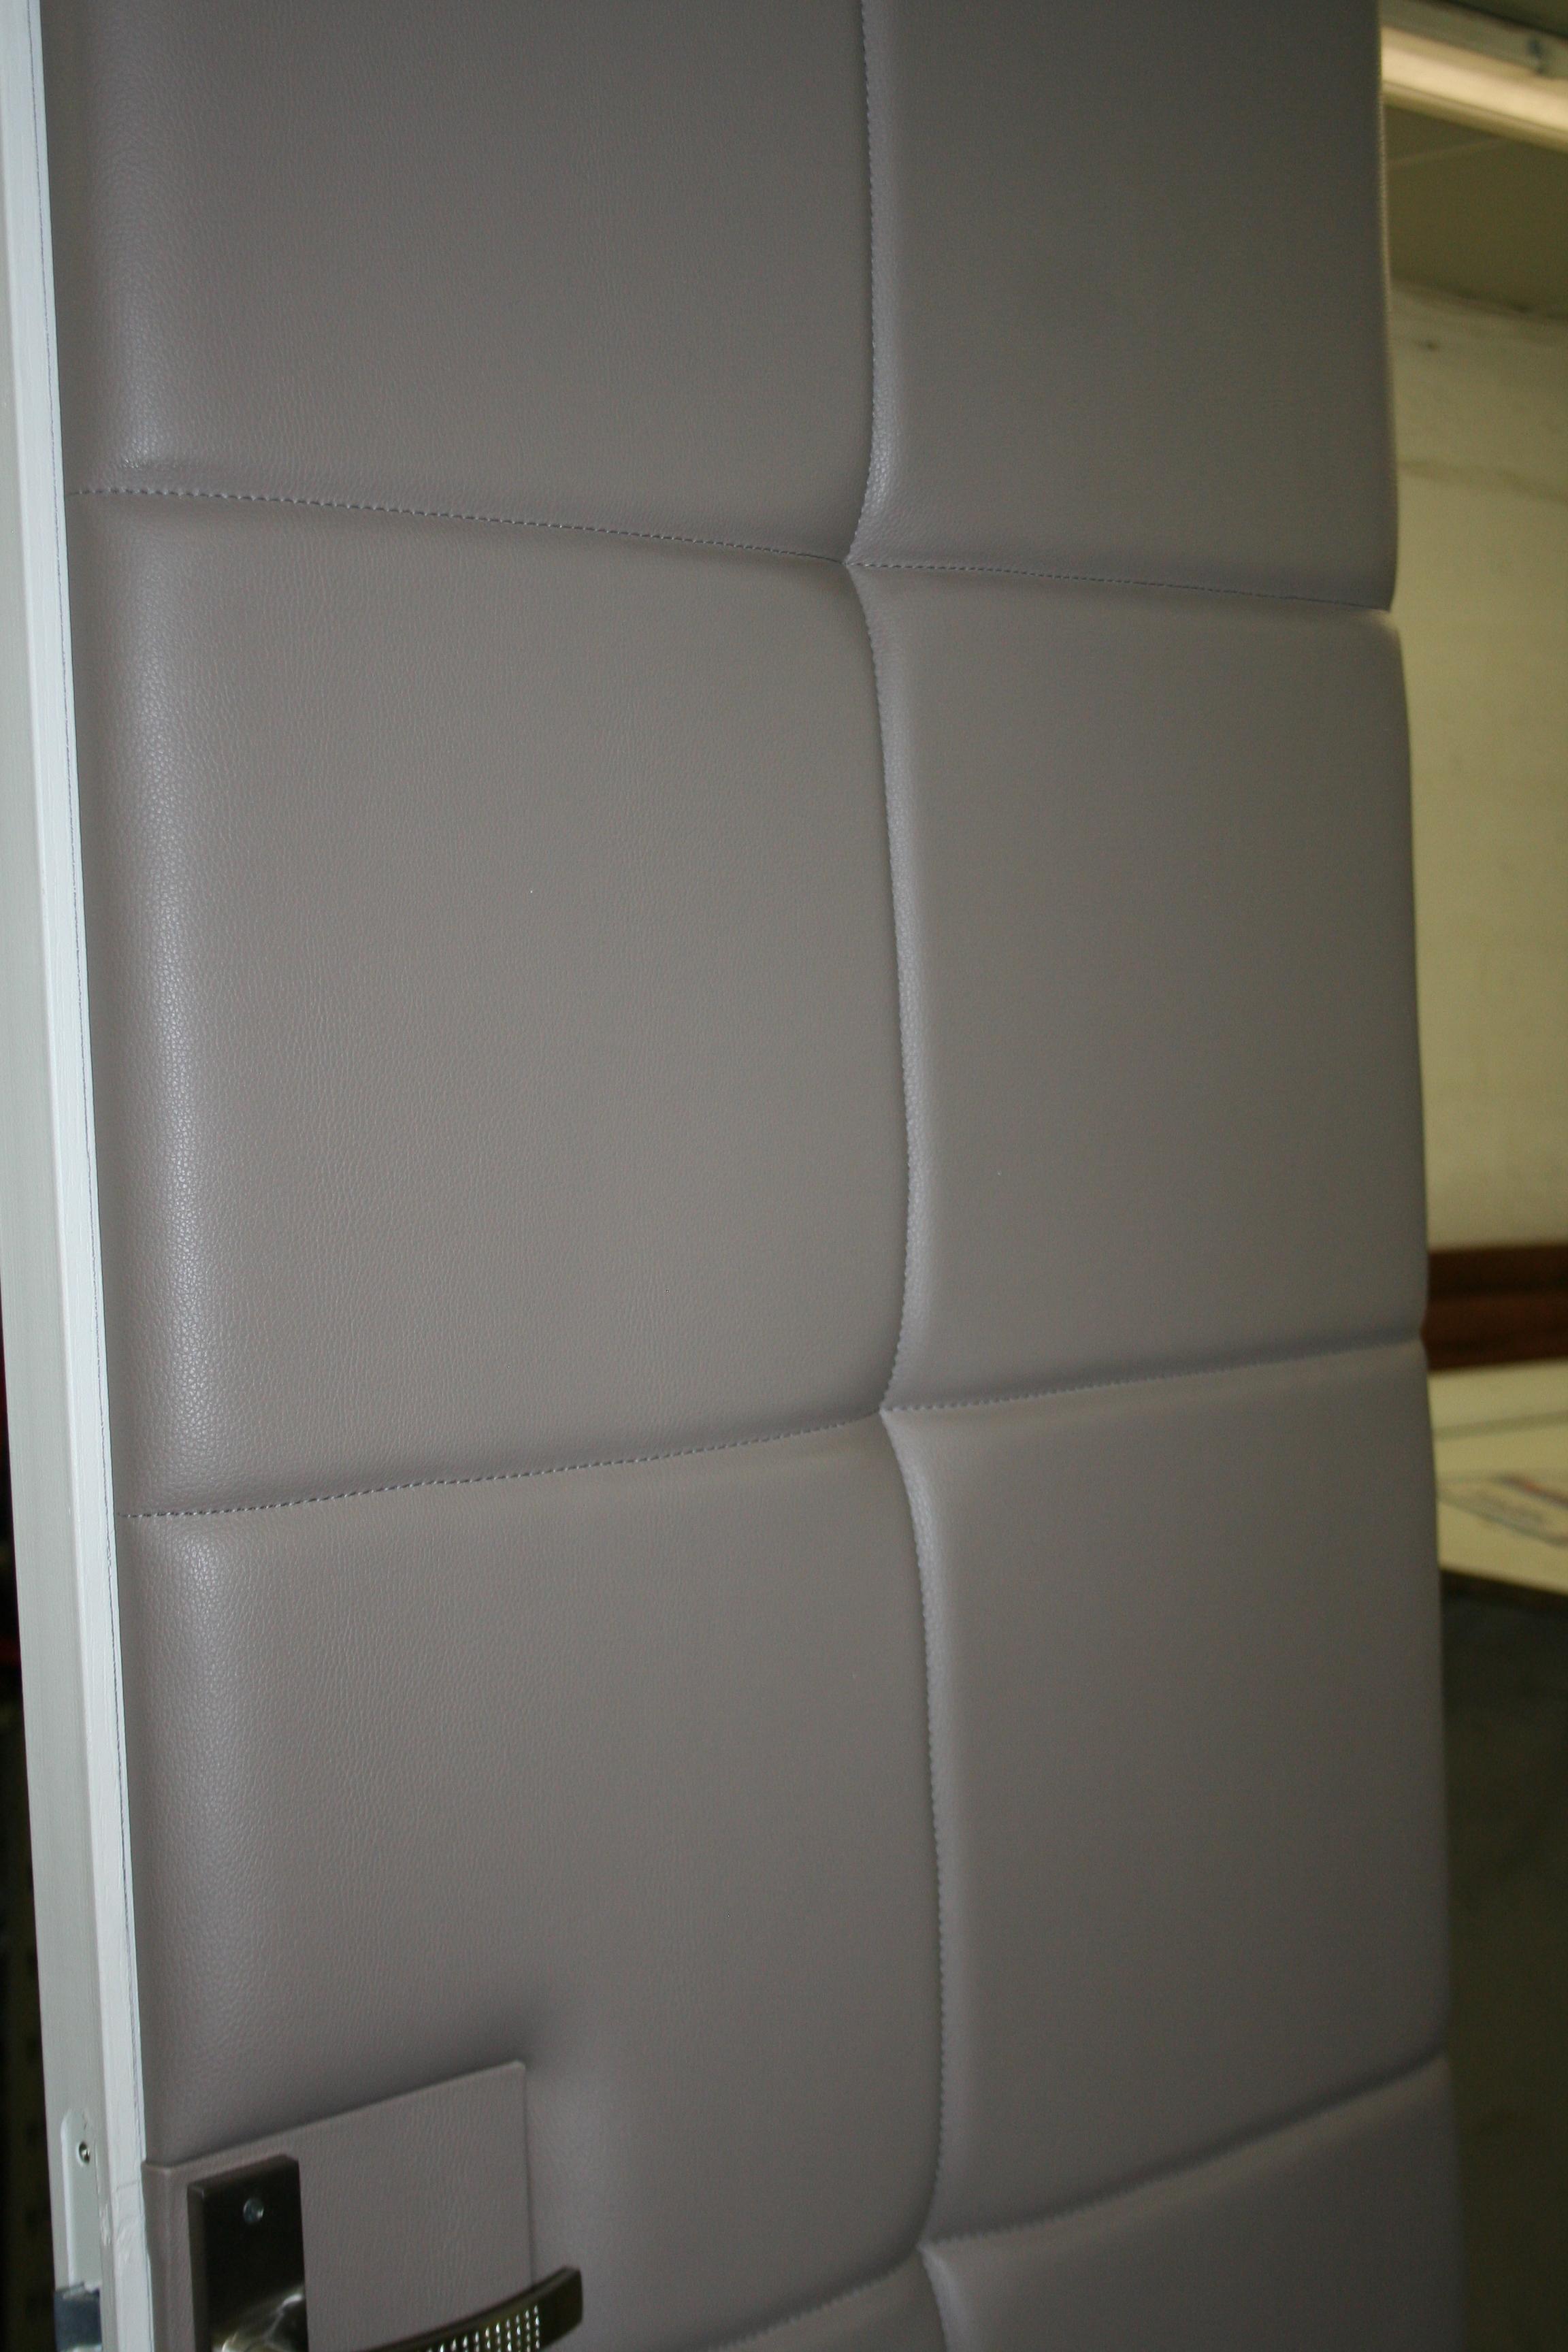 porte capitonn e jplecomte mobilier. Black Bedroom Furniture Sets. Home Design Ideas